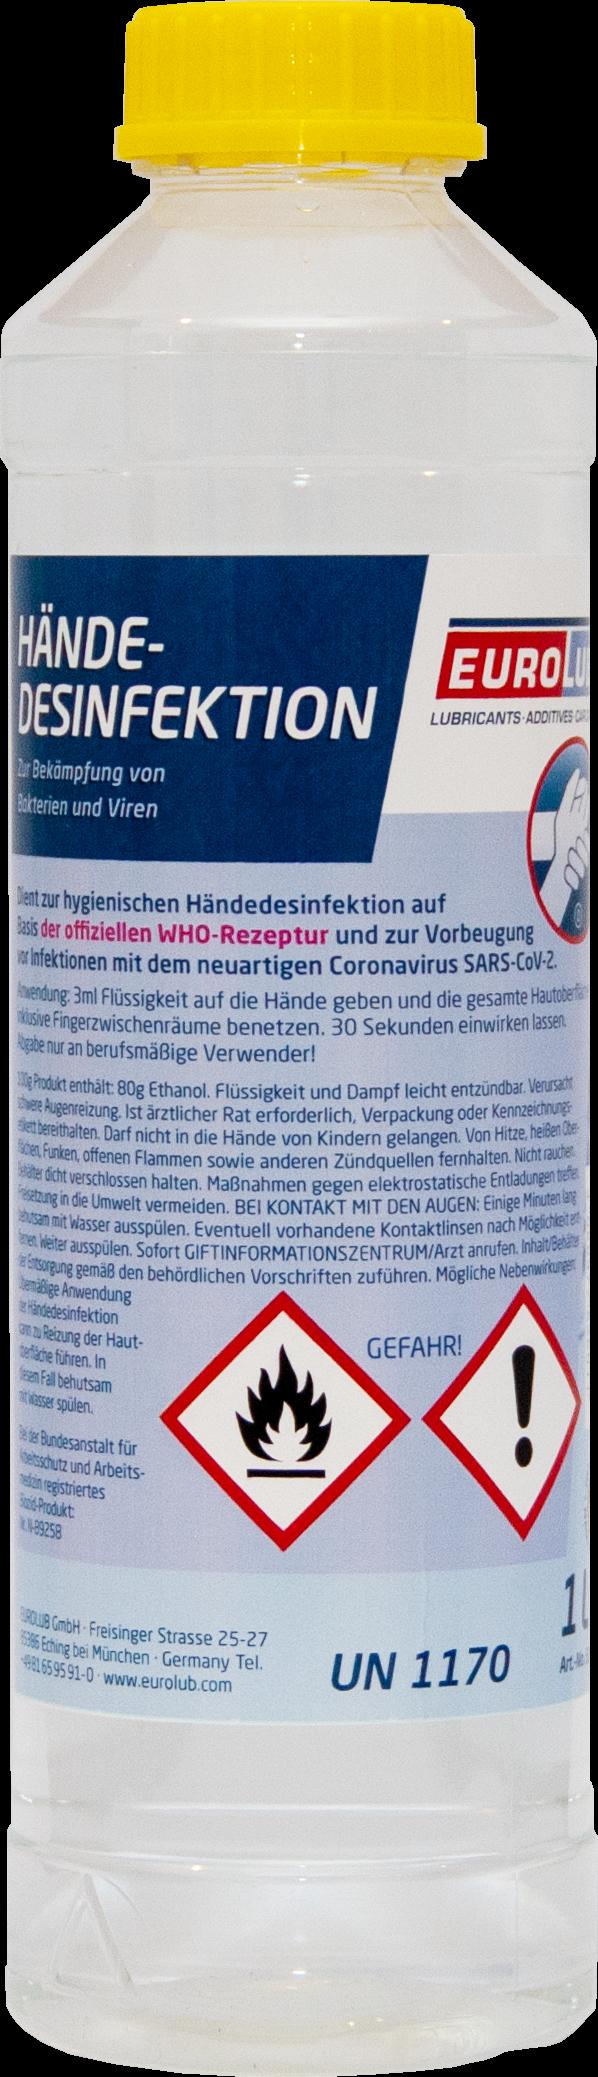 EUROLUB Händedesinfektion Desinfektionsmittel 1 Liter Flasche